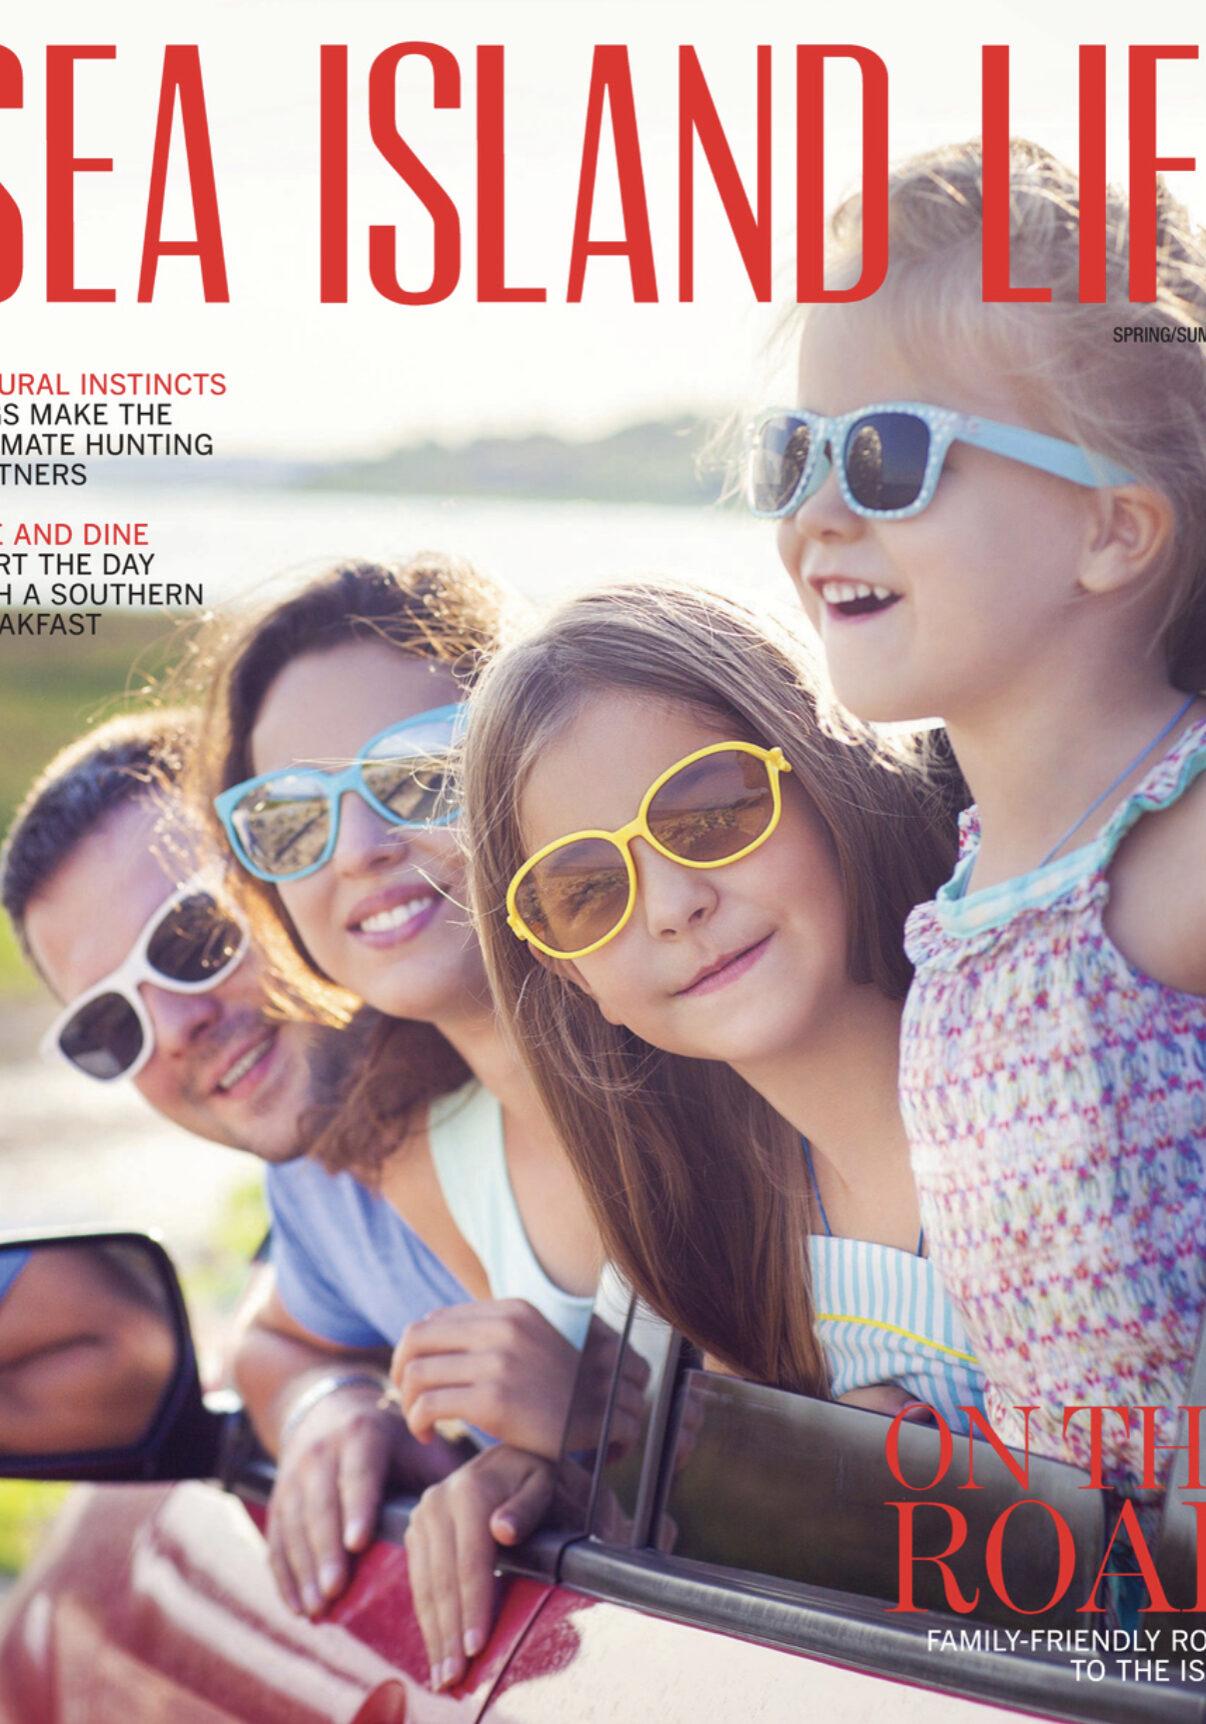 Sea Island Life Magazine - Spring/Summer 2017